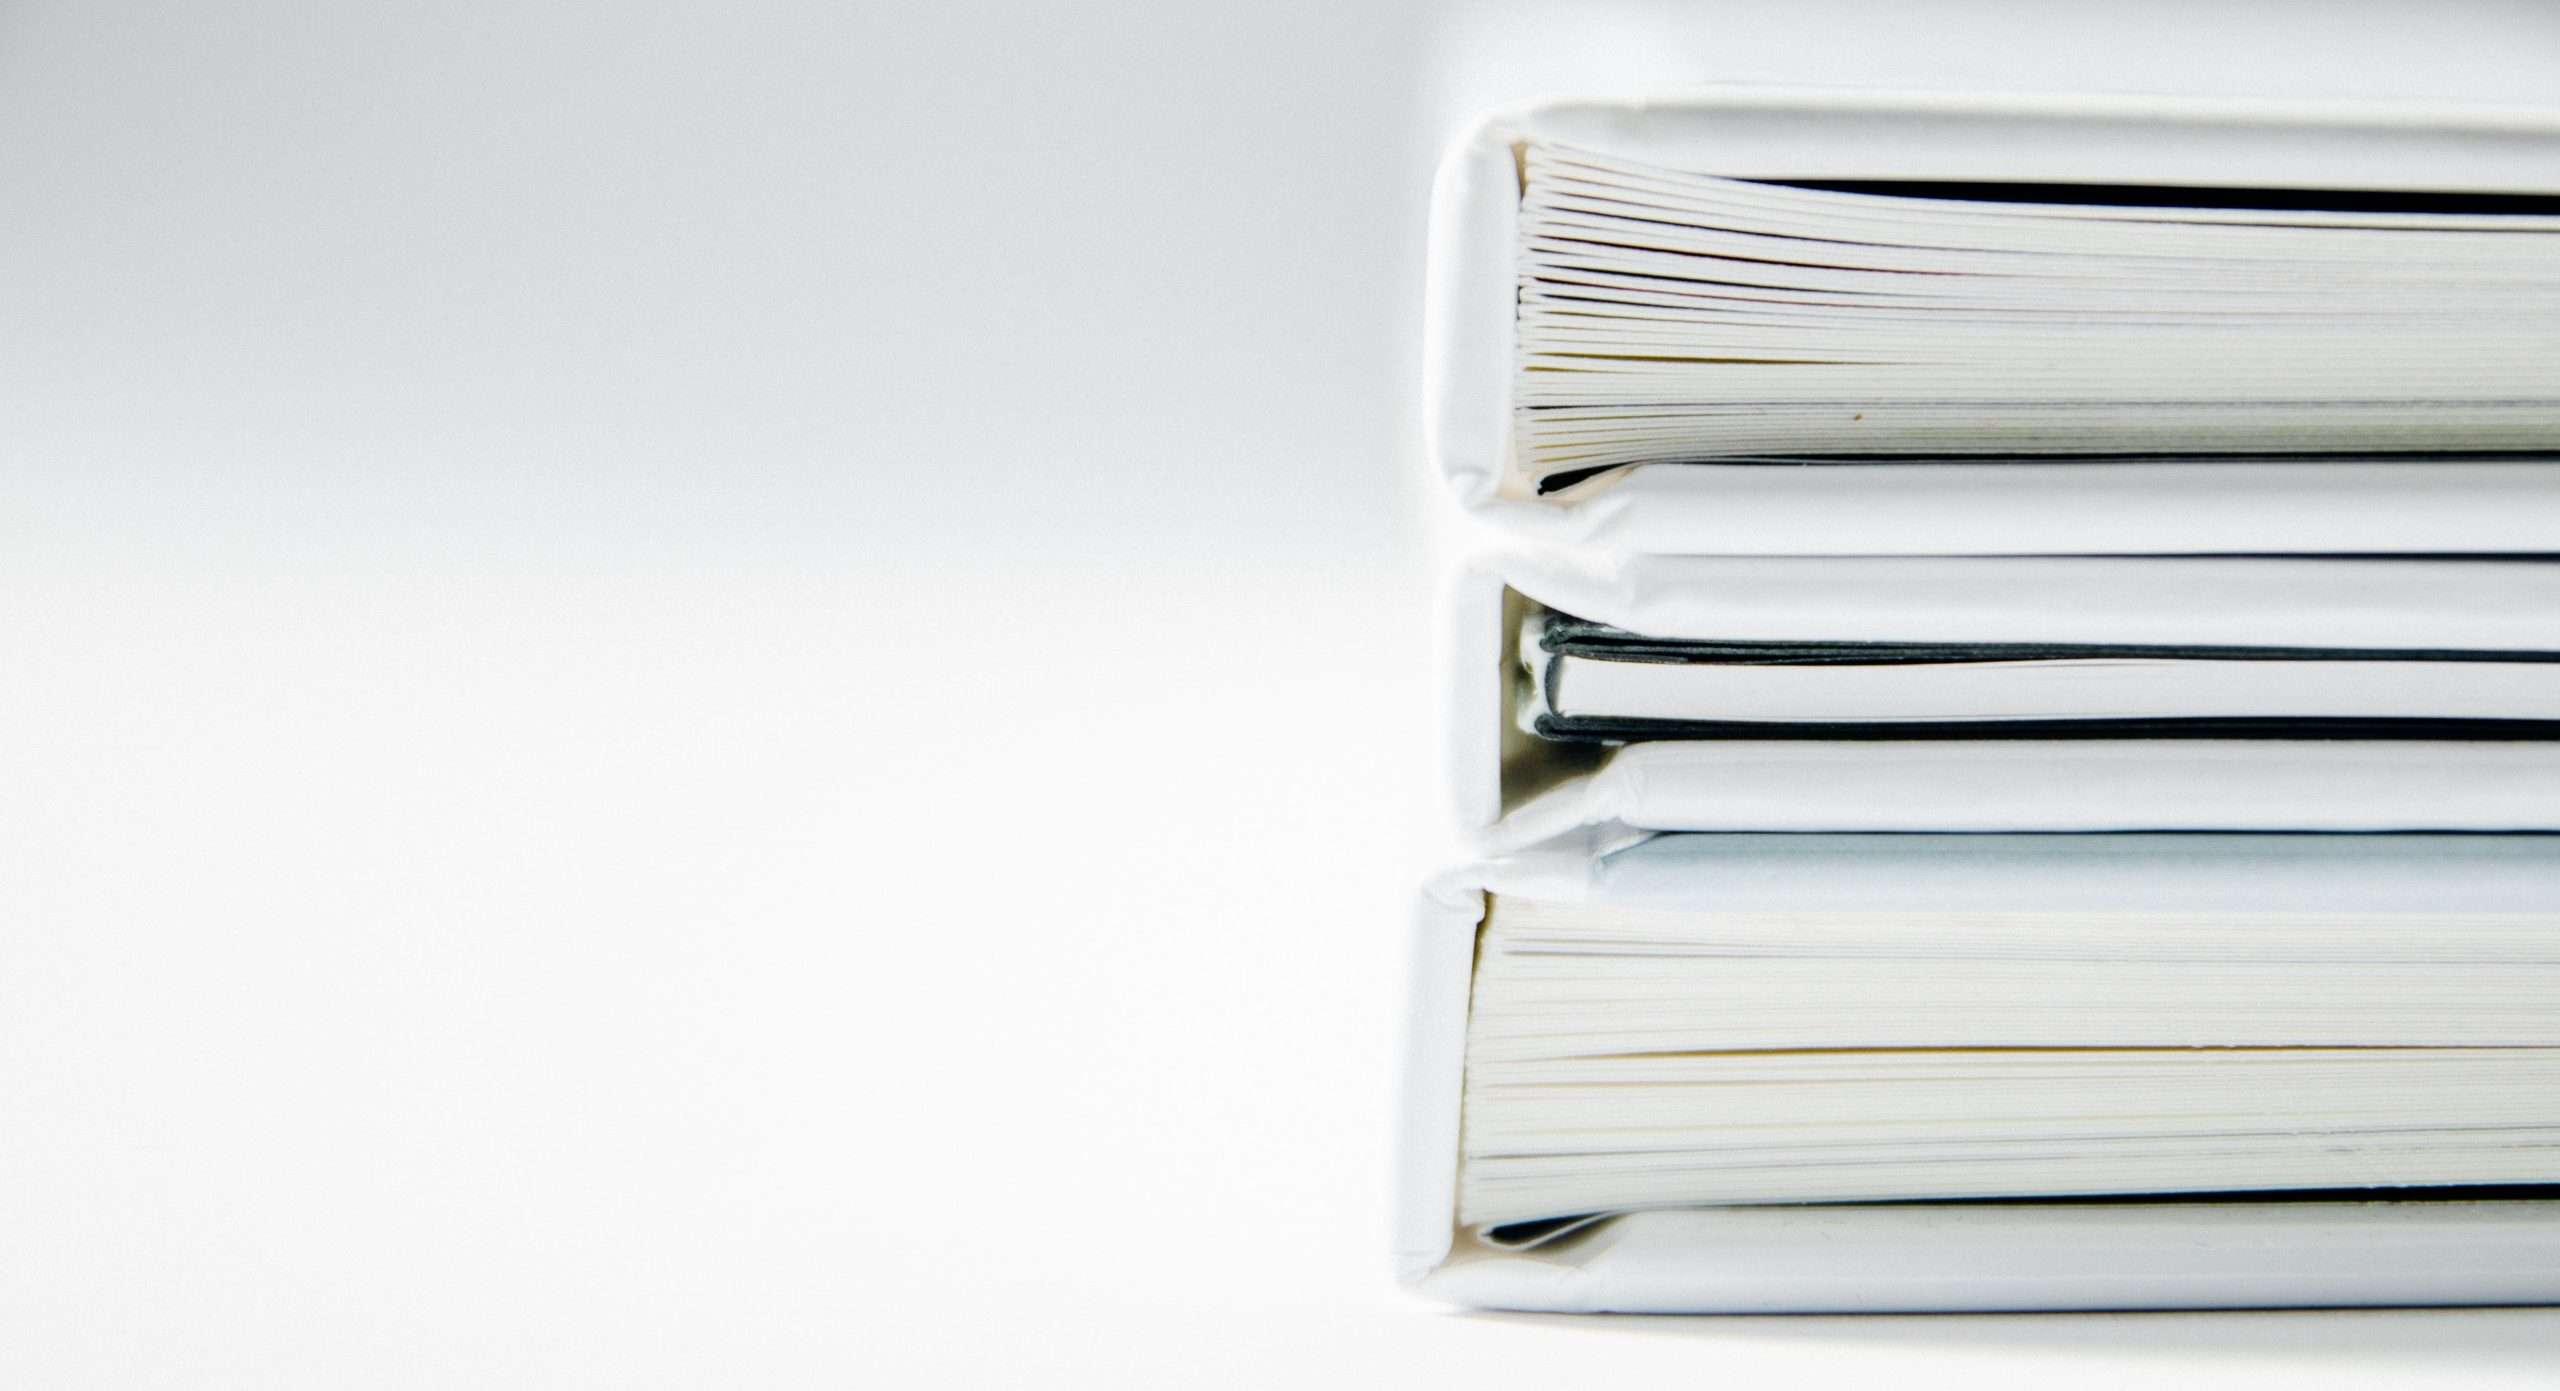 Average settlement offers during mediation